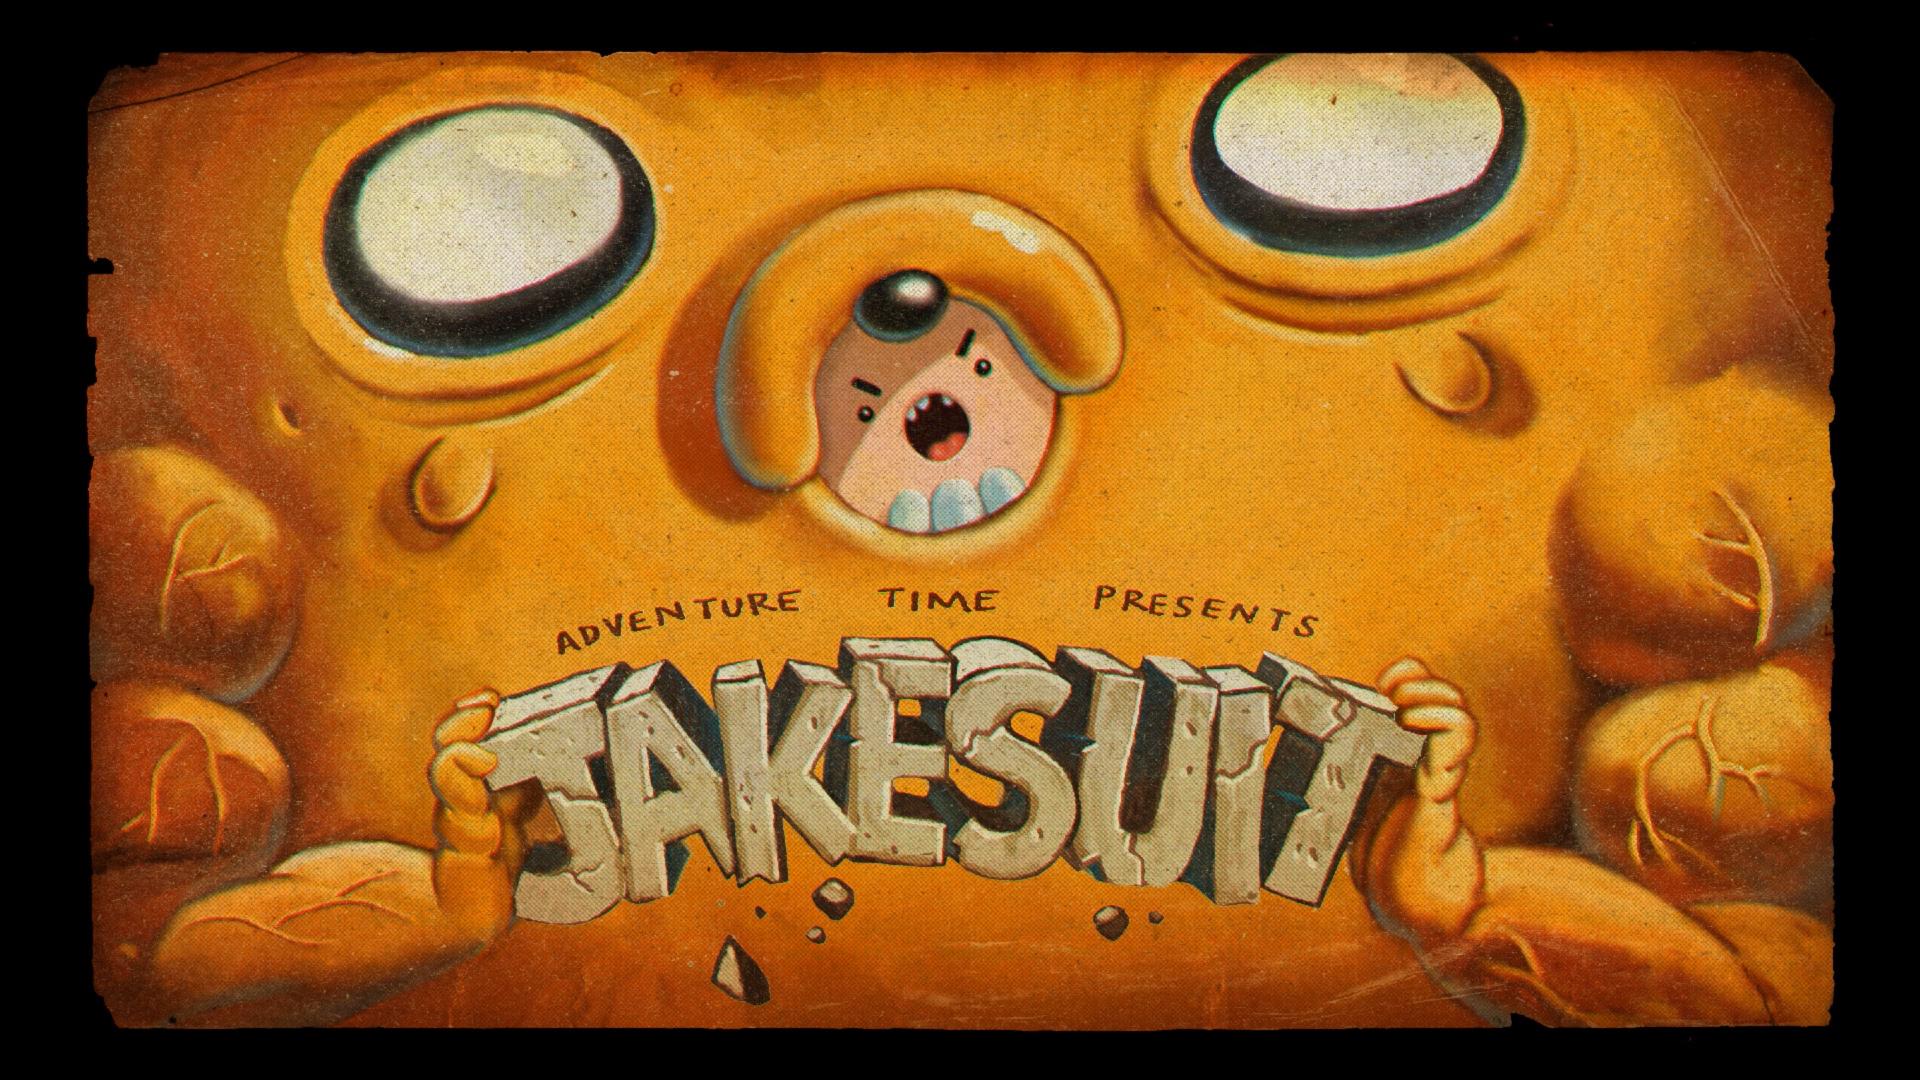 Jake Suit | Adventure Time Wiki | FANDOM powered by Wikia